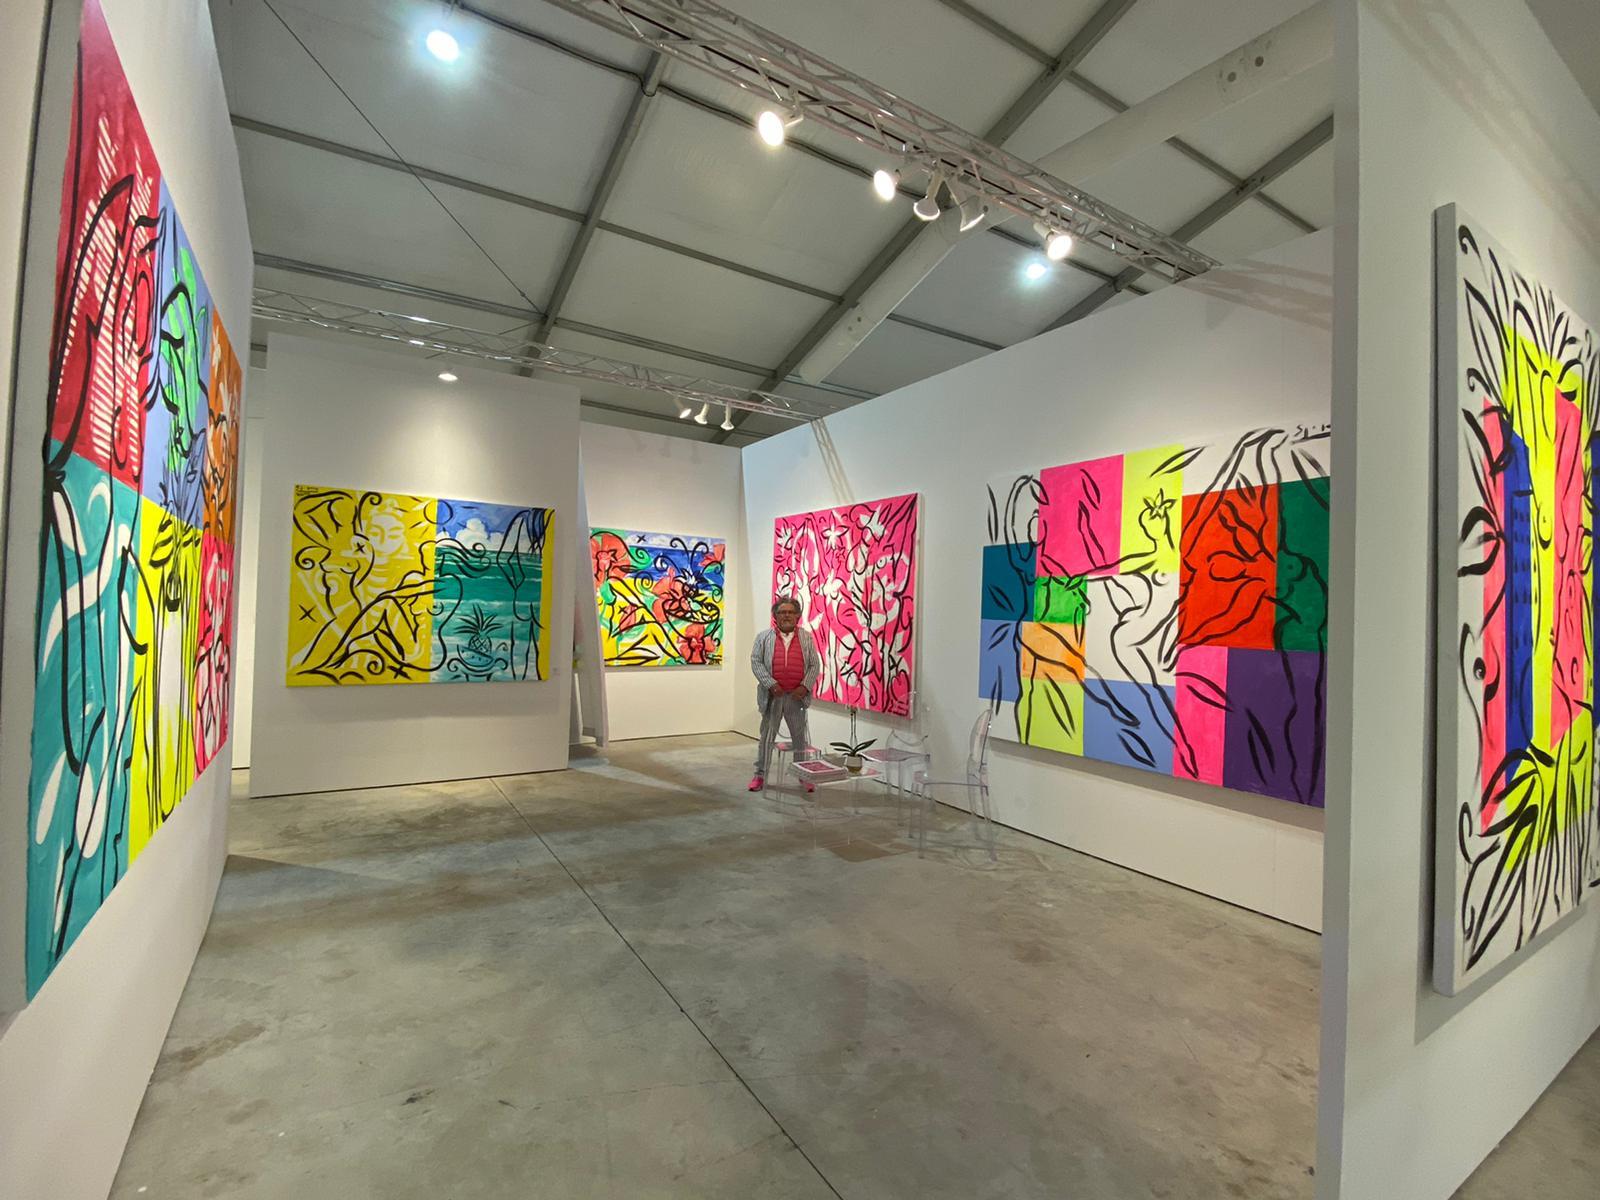 Art Basel Miami | Painting by Stefan Szczesny | 2019 | Acrylic on Canvas | buy online | Szczesny Art Shop